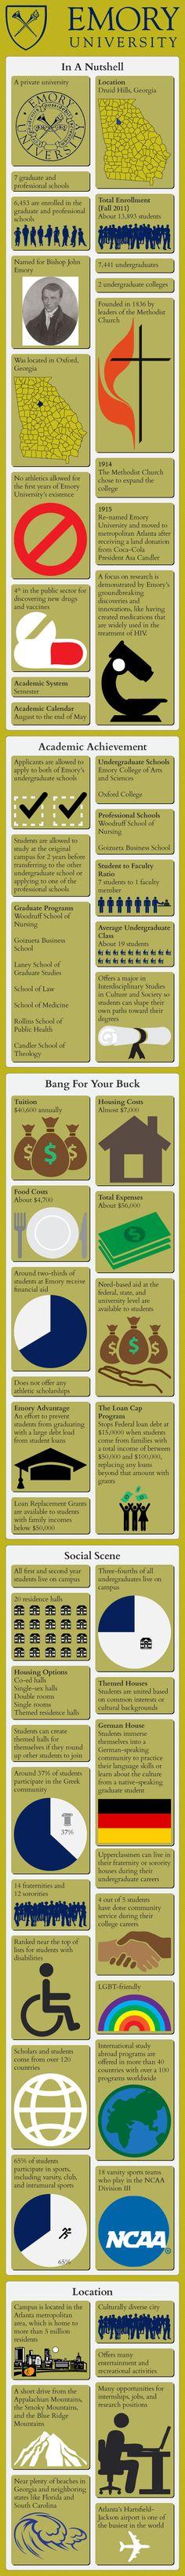 Emory University #Infographic